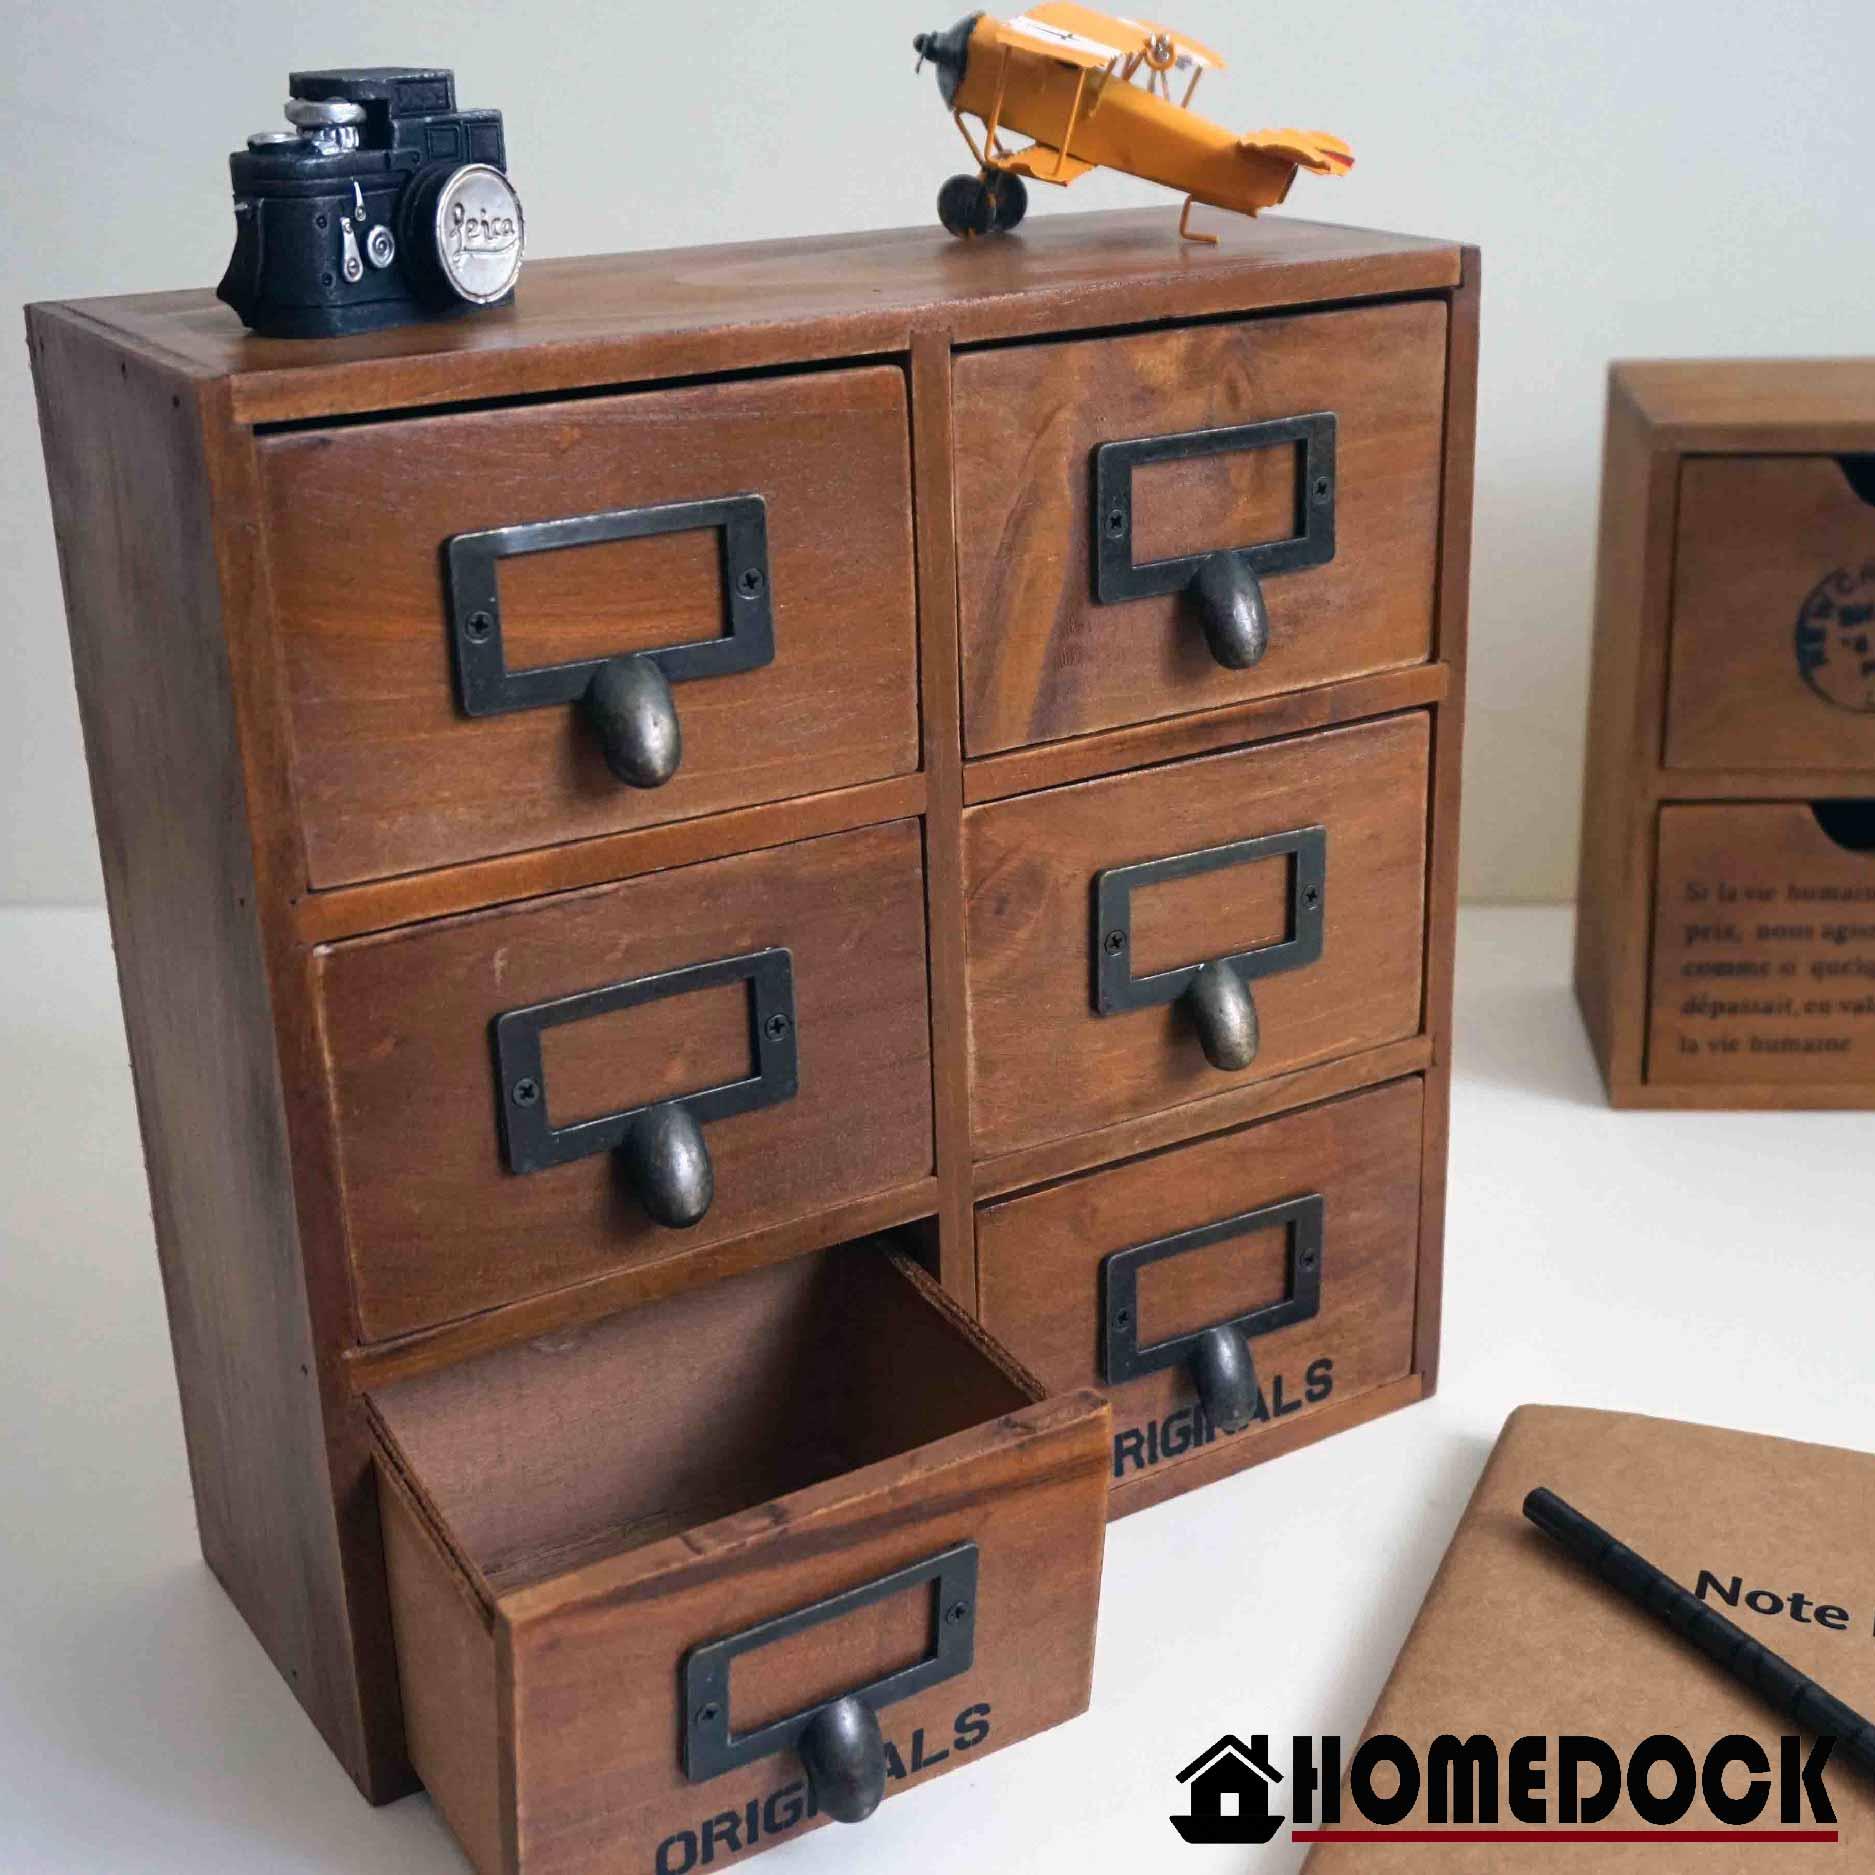 HOMEDOCK-原木質感6格整理收納櫃 六層/六格/木櫃/置物櫃/原木製/層格櫃/抽屜/Zakka/木櫃